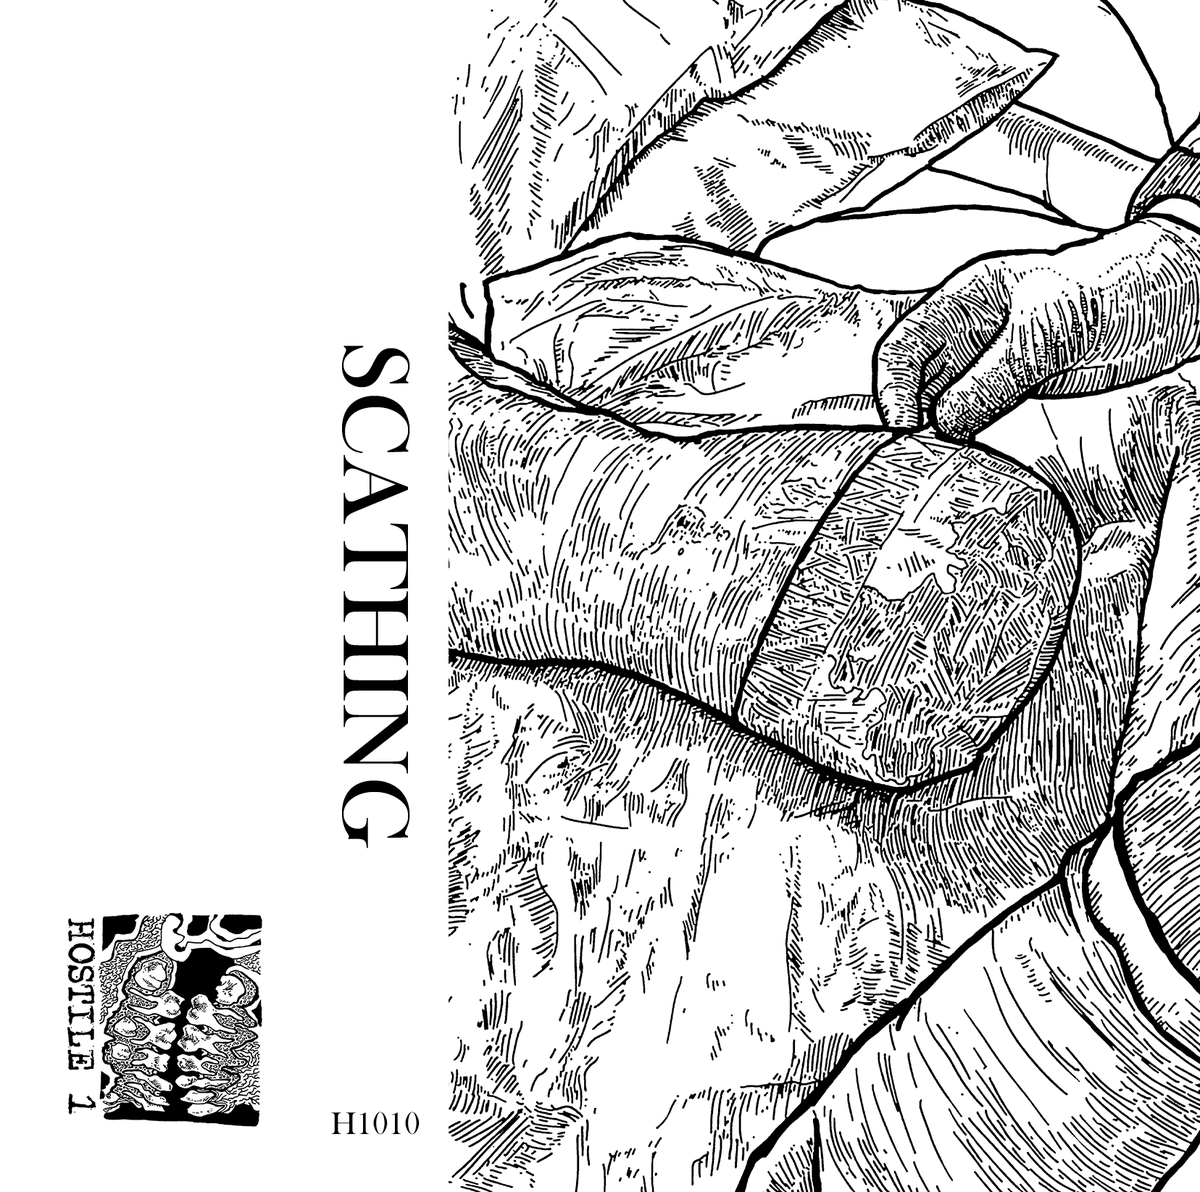 Image of Scathing - Untitled